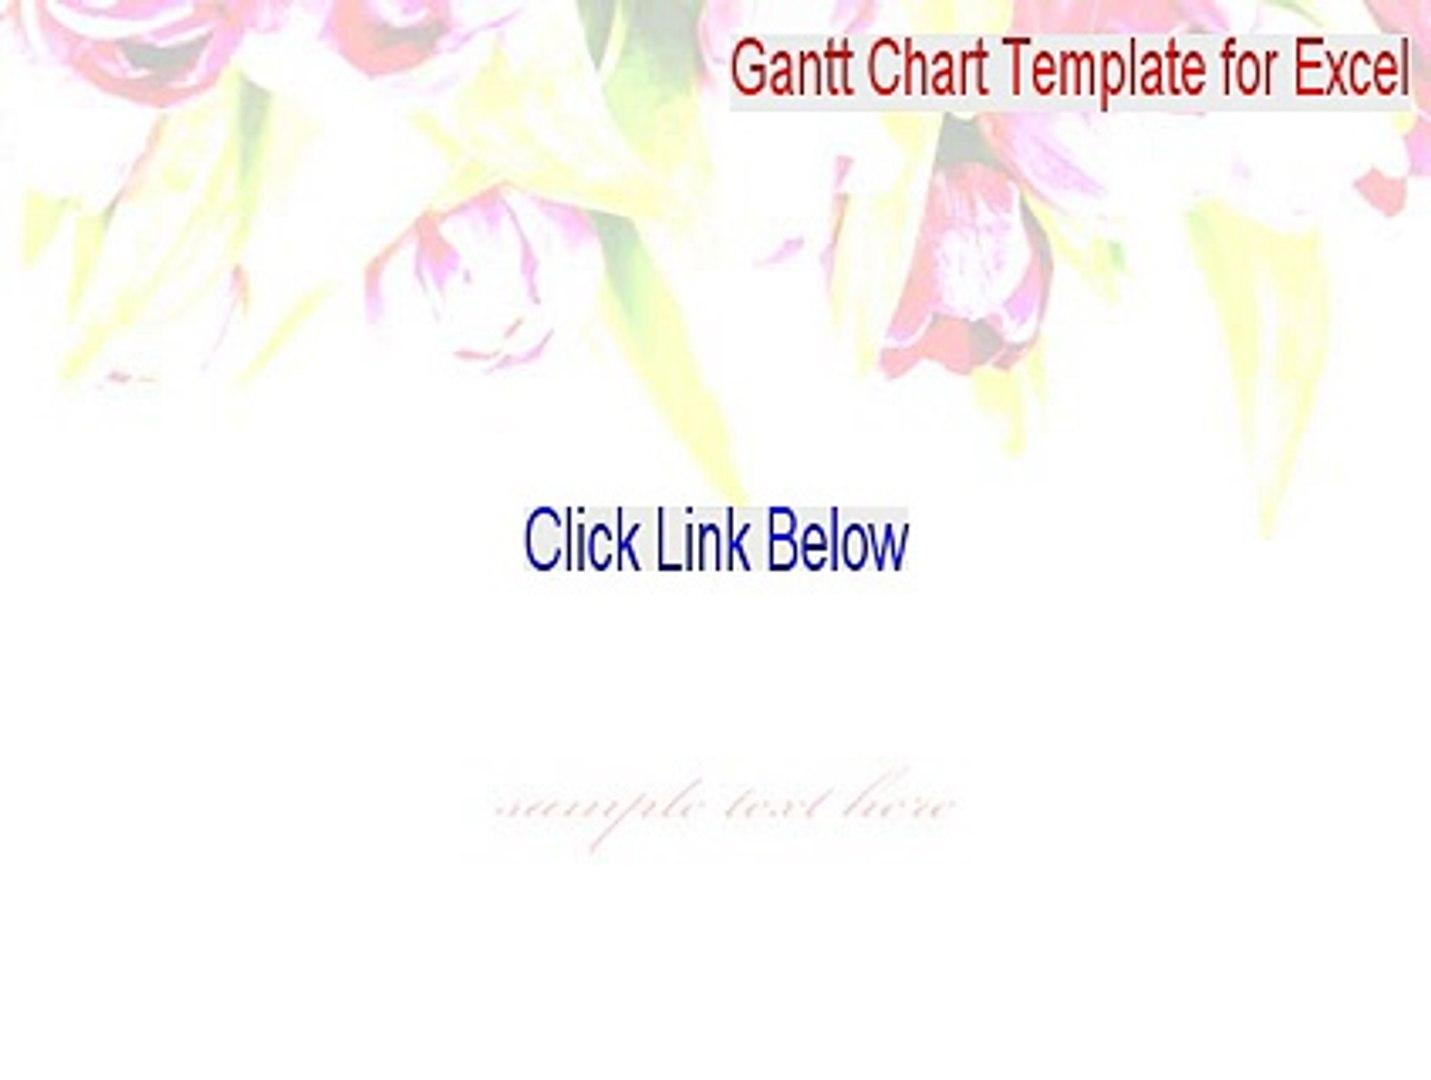 Gantt Chart Template For Excel 2010